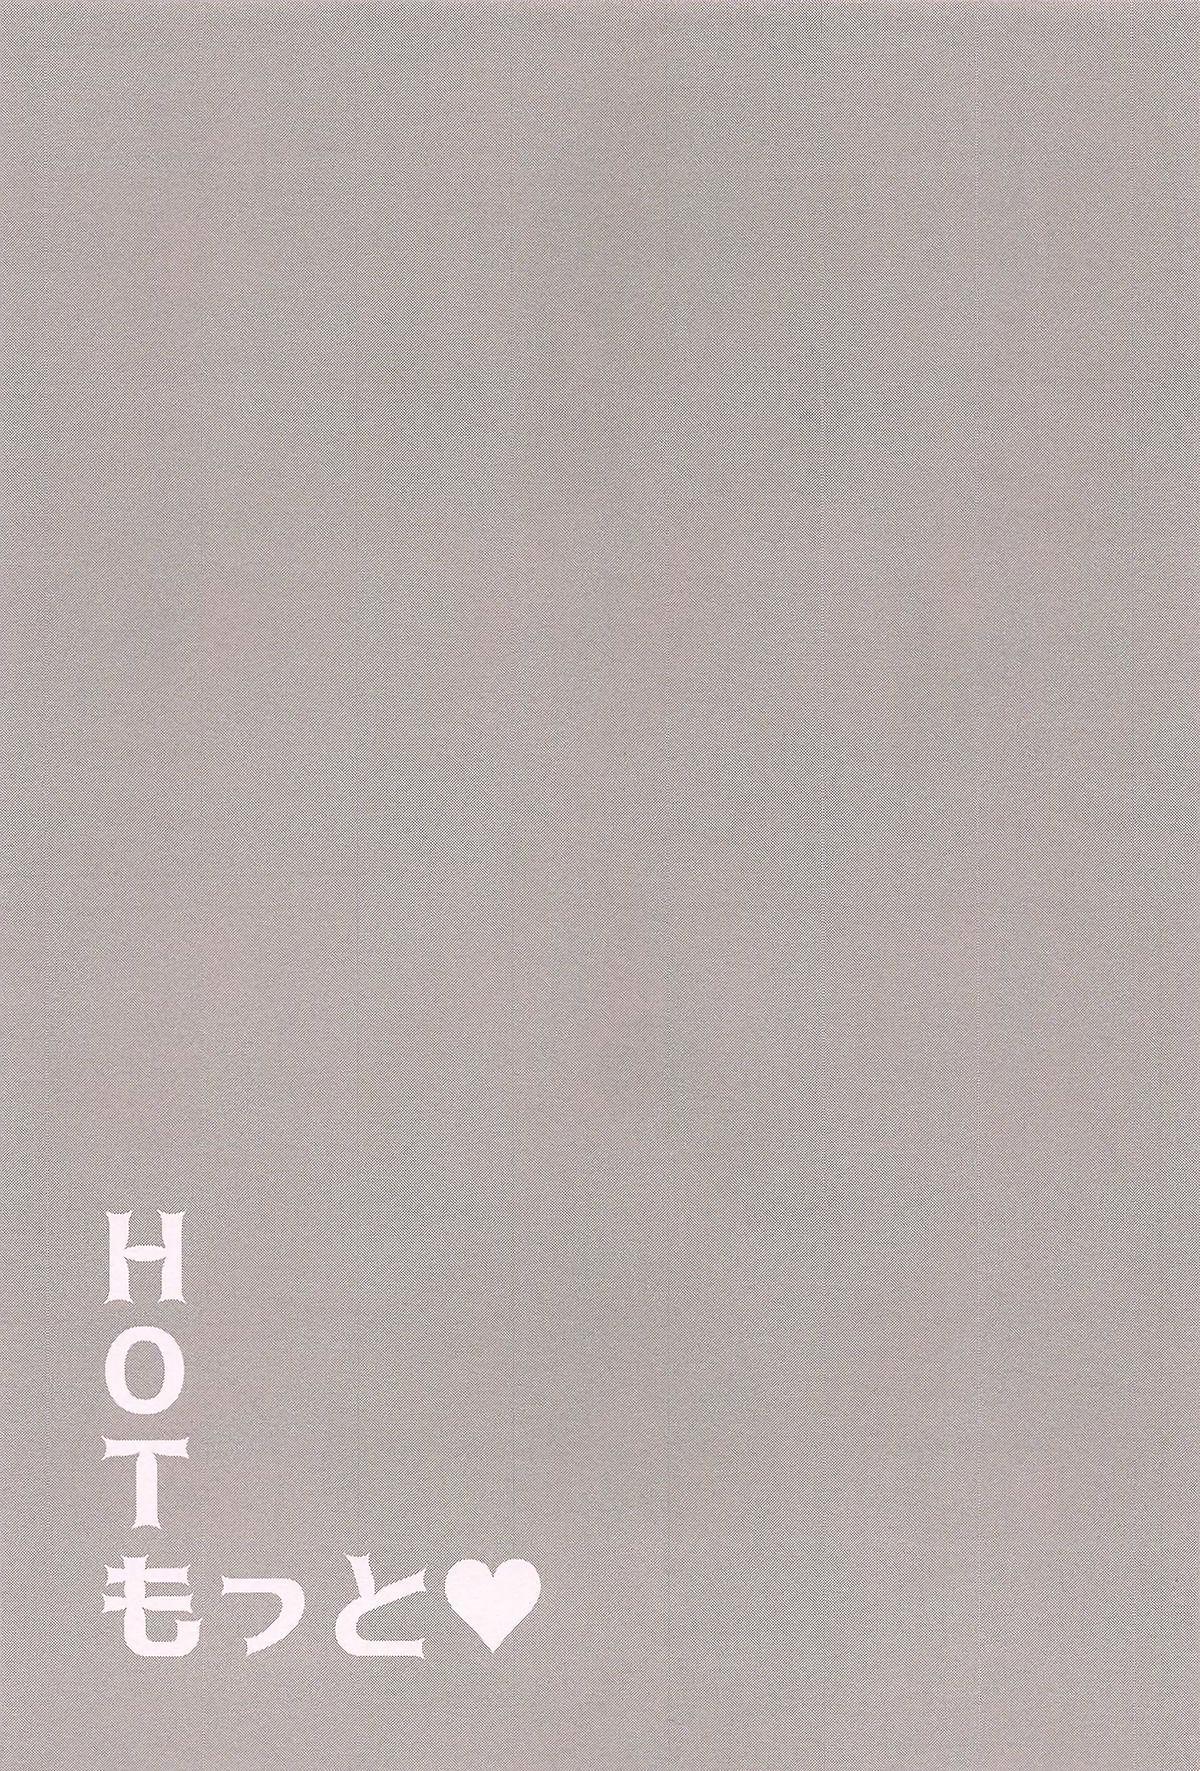 HOT Motto 17